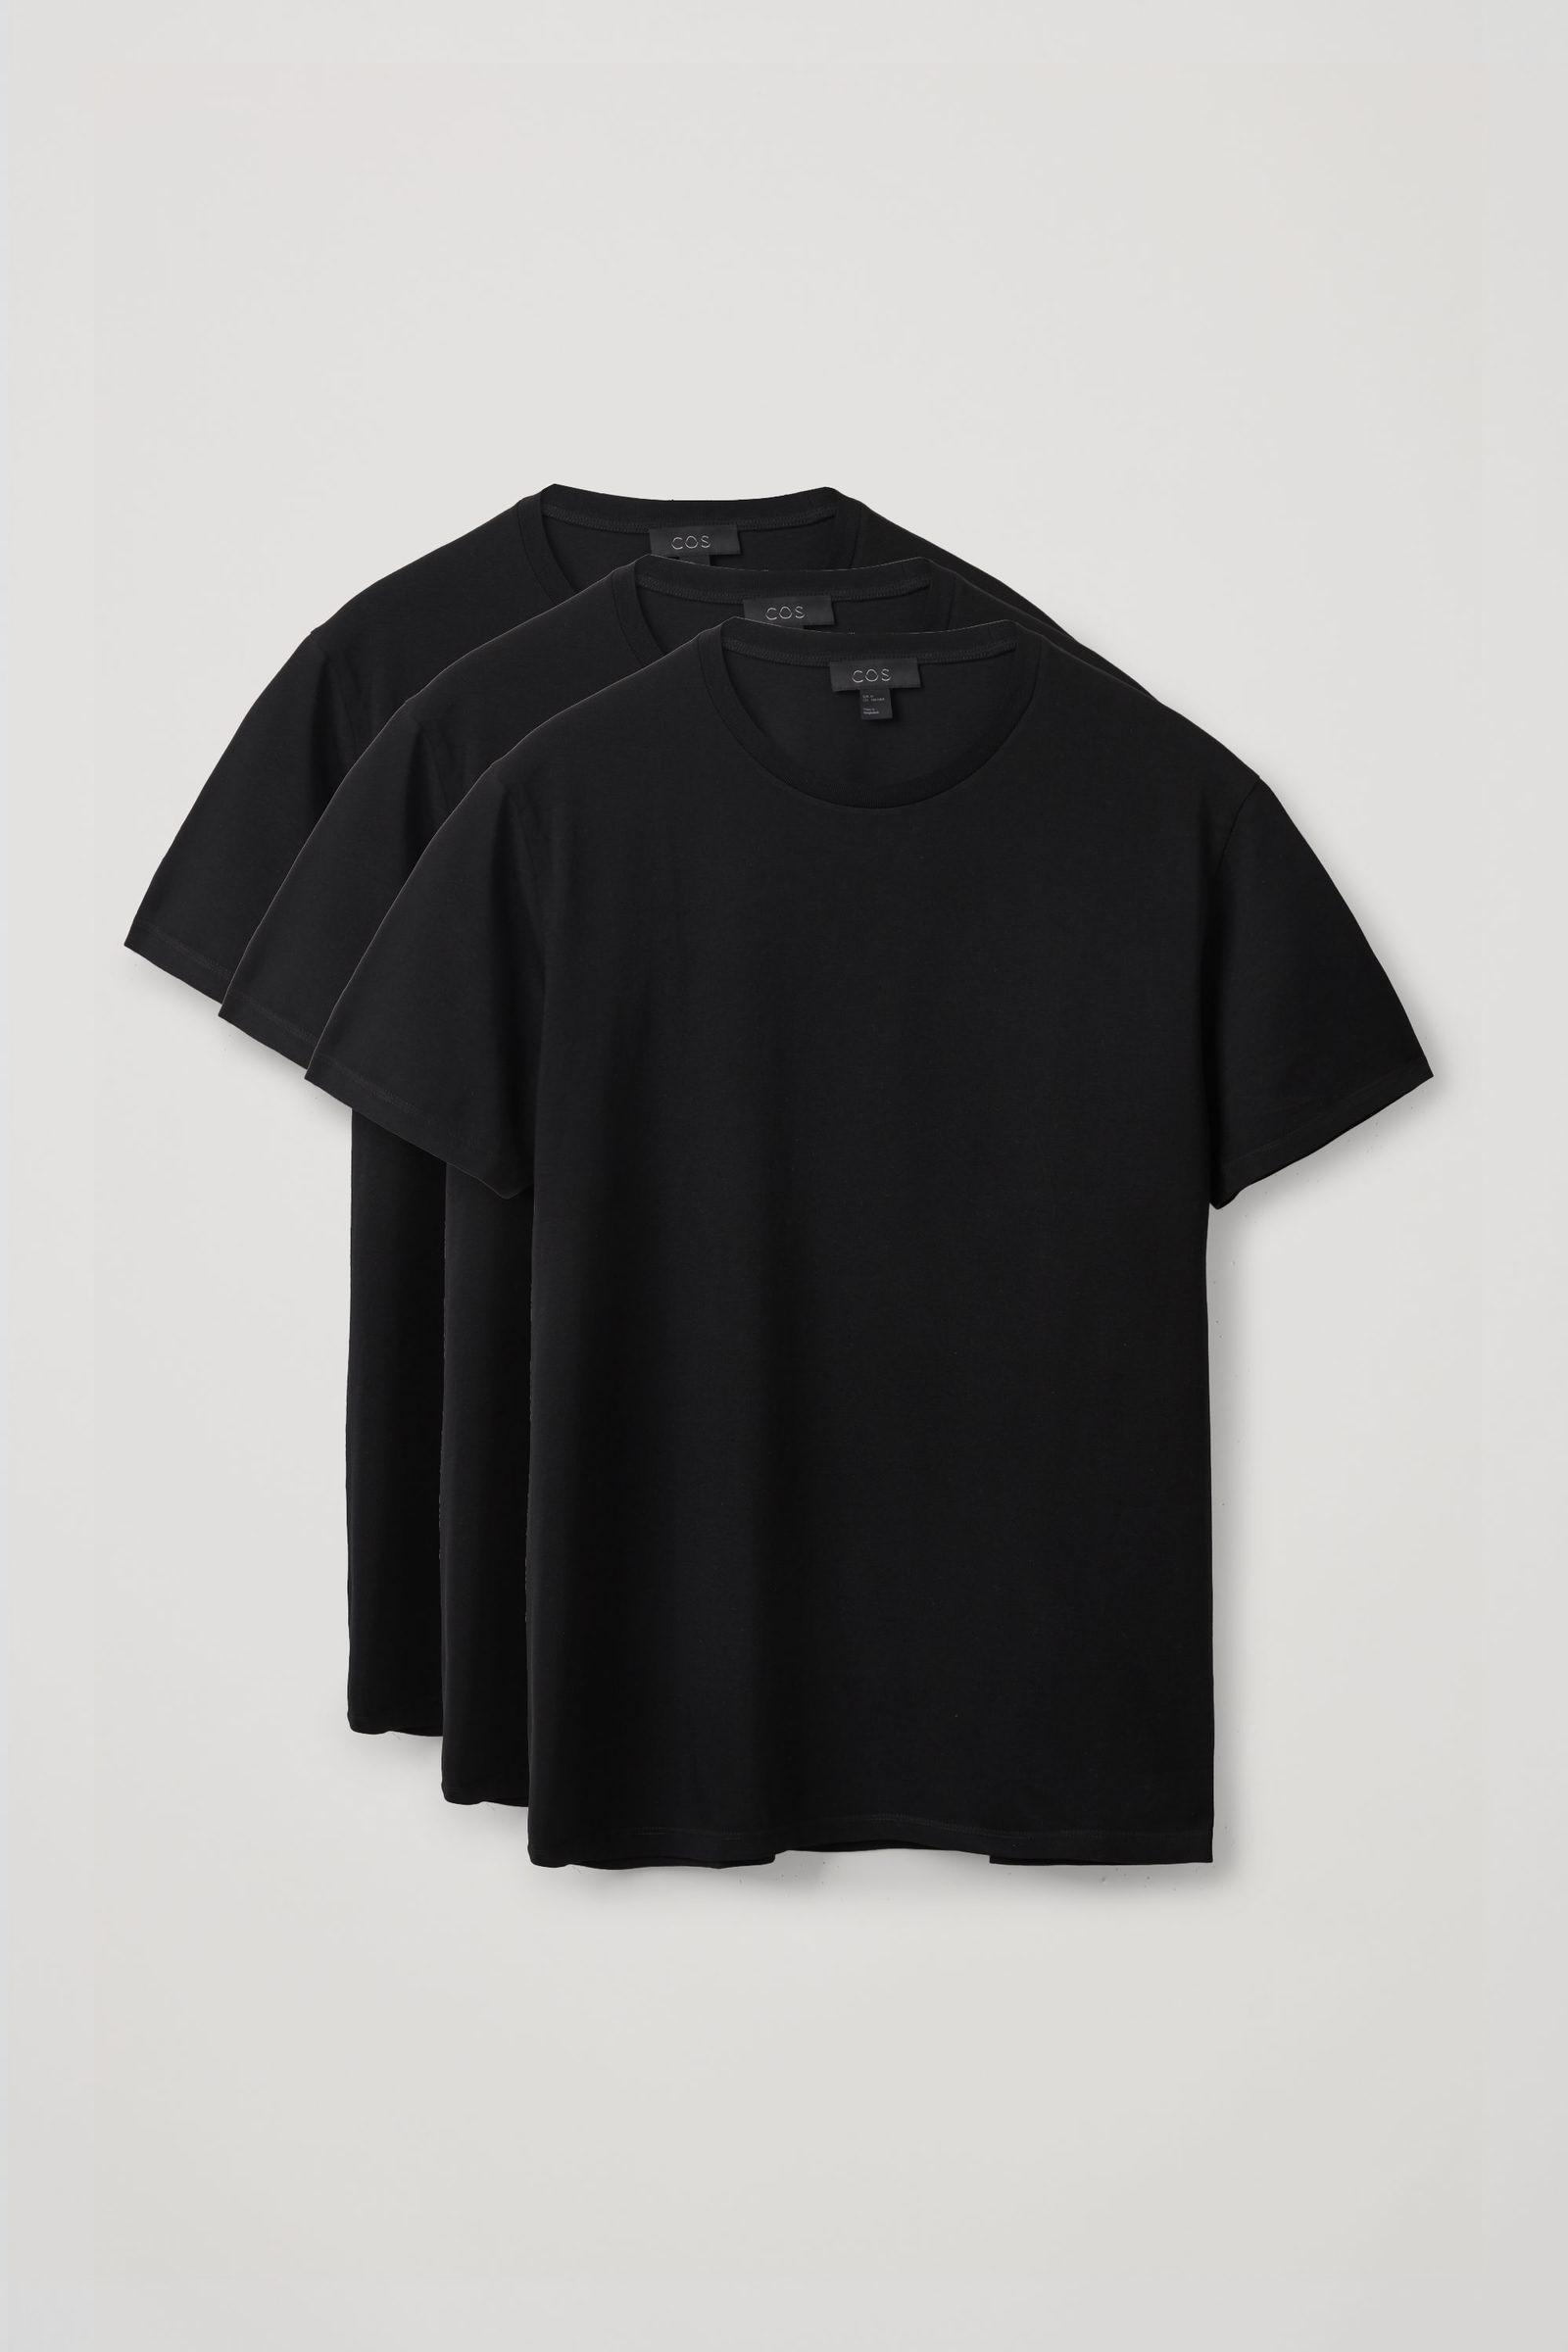 COS 레귤러 핏 티셔츠 3팩의 블랙컬러 Product입니다.